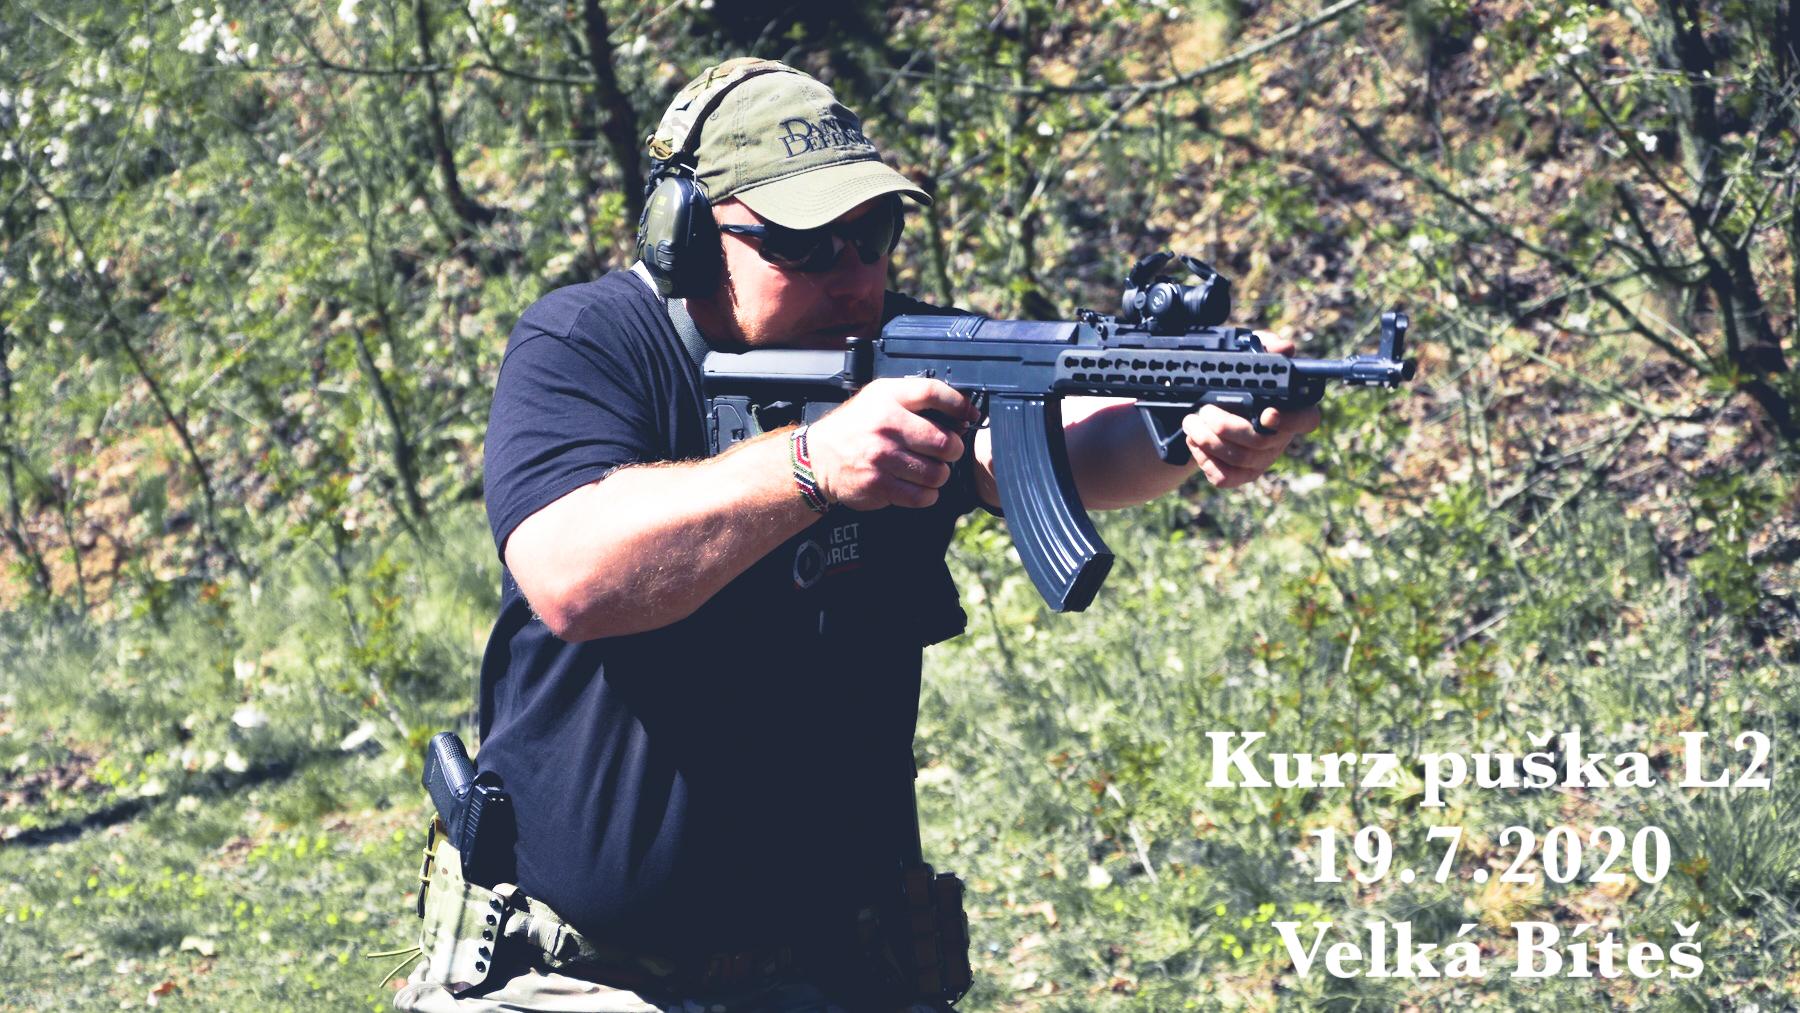 Kurz puška L2 dne 19.7.2020